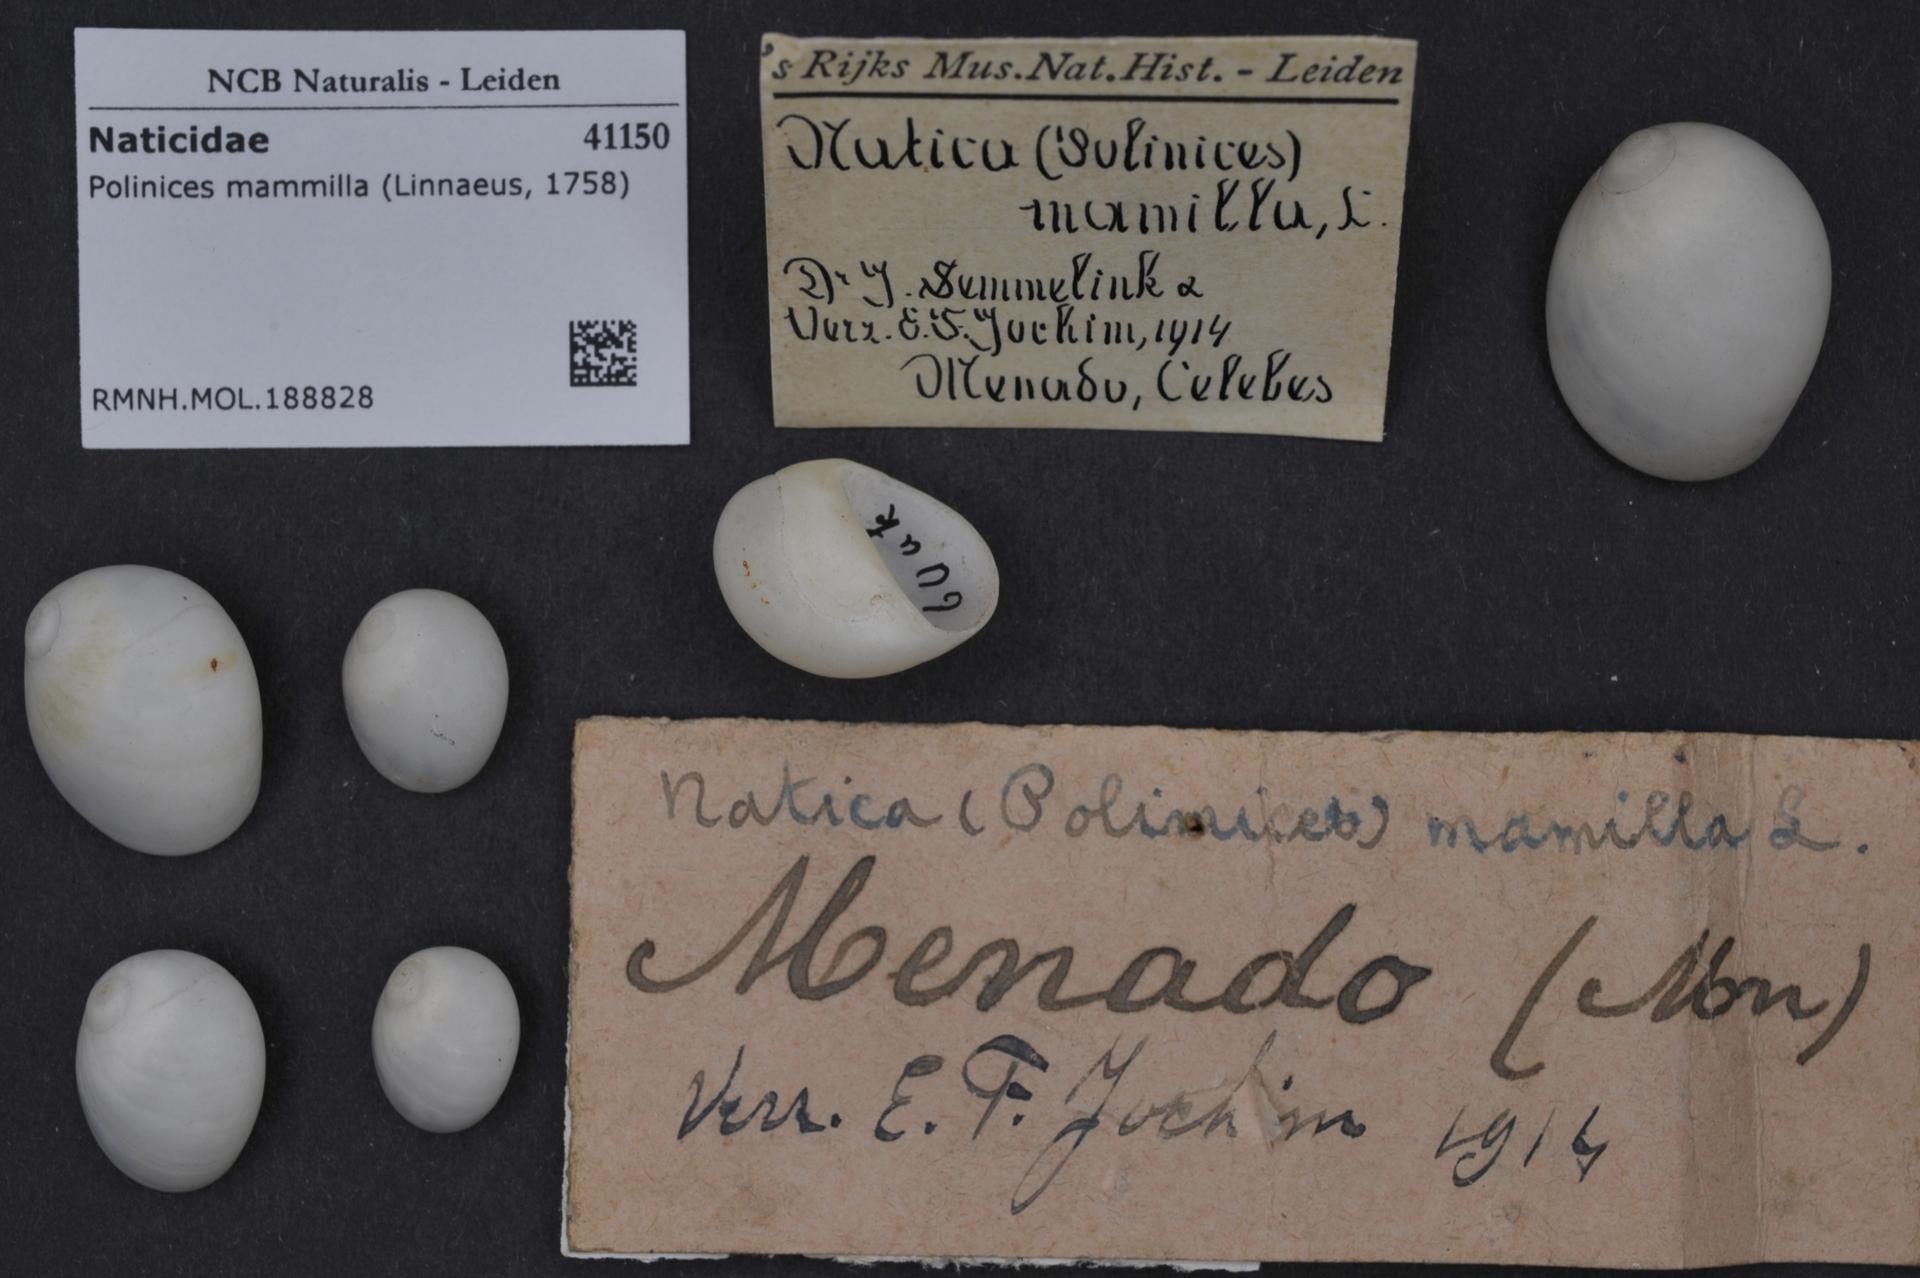 RMNH.MOL.188828 | Polinices mammilla (Linnaeus, 1758)